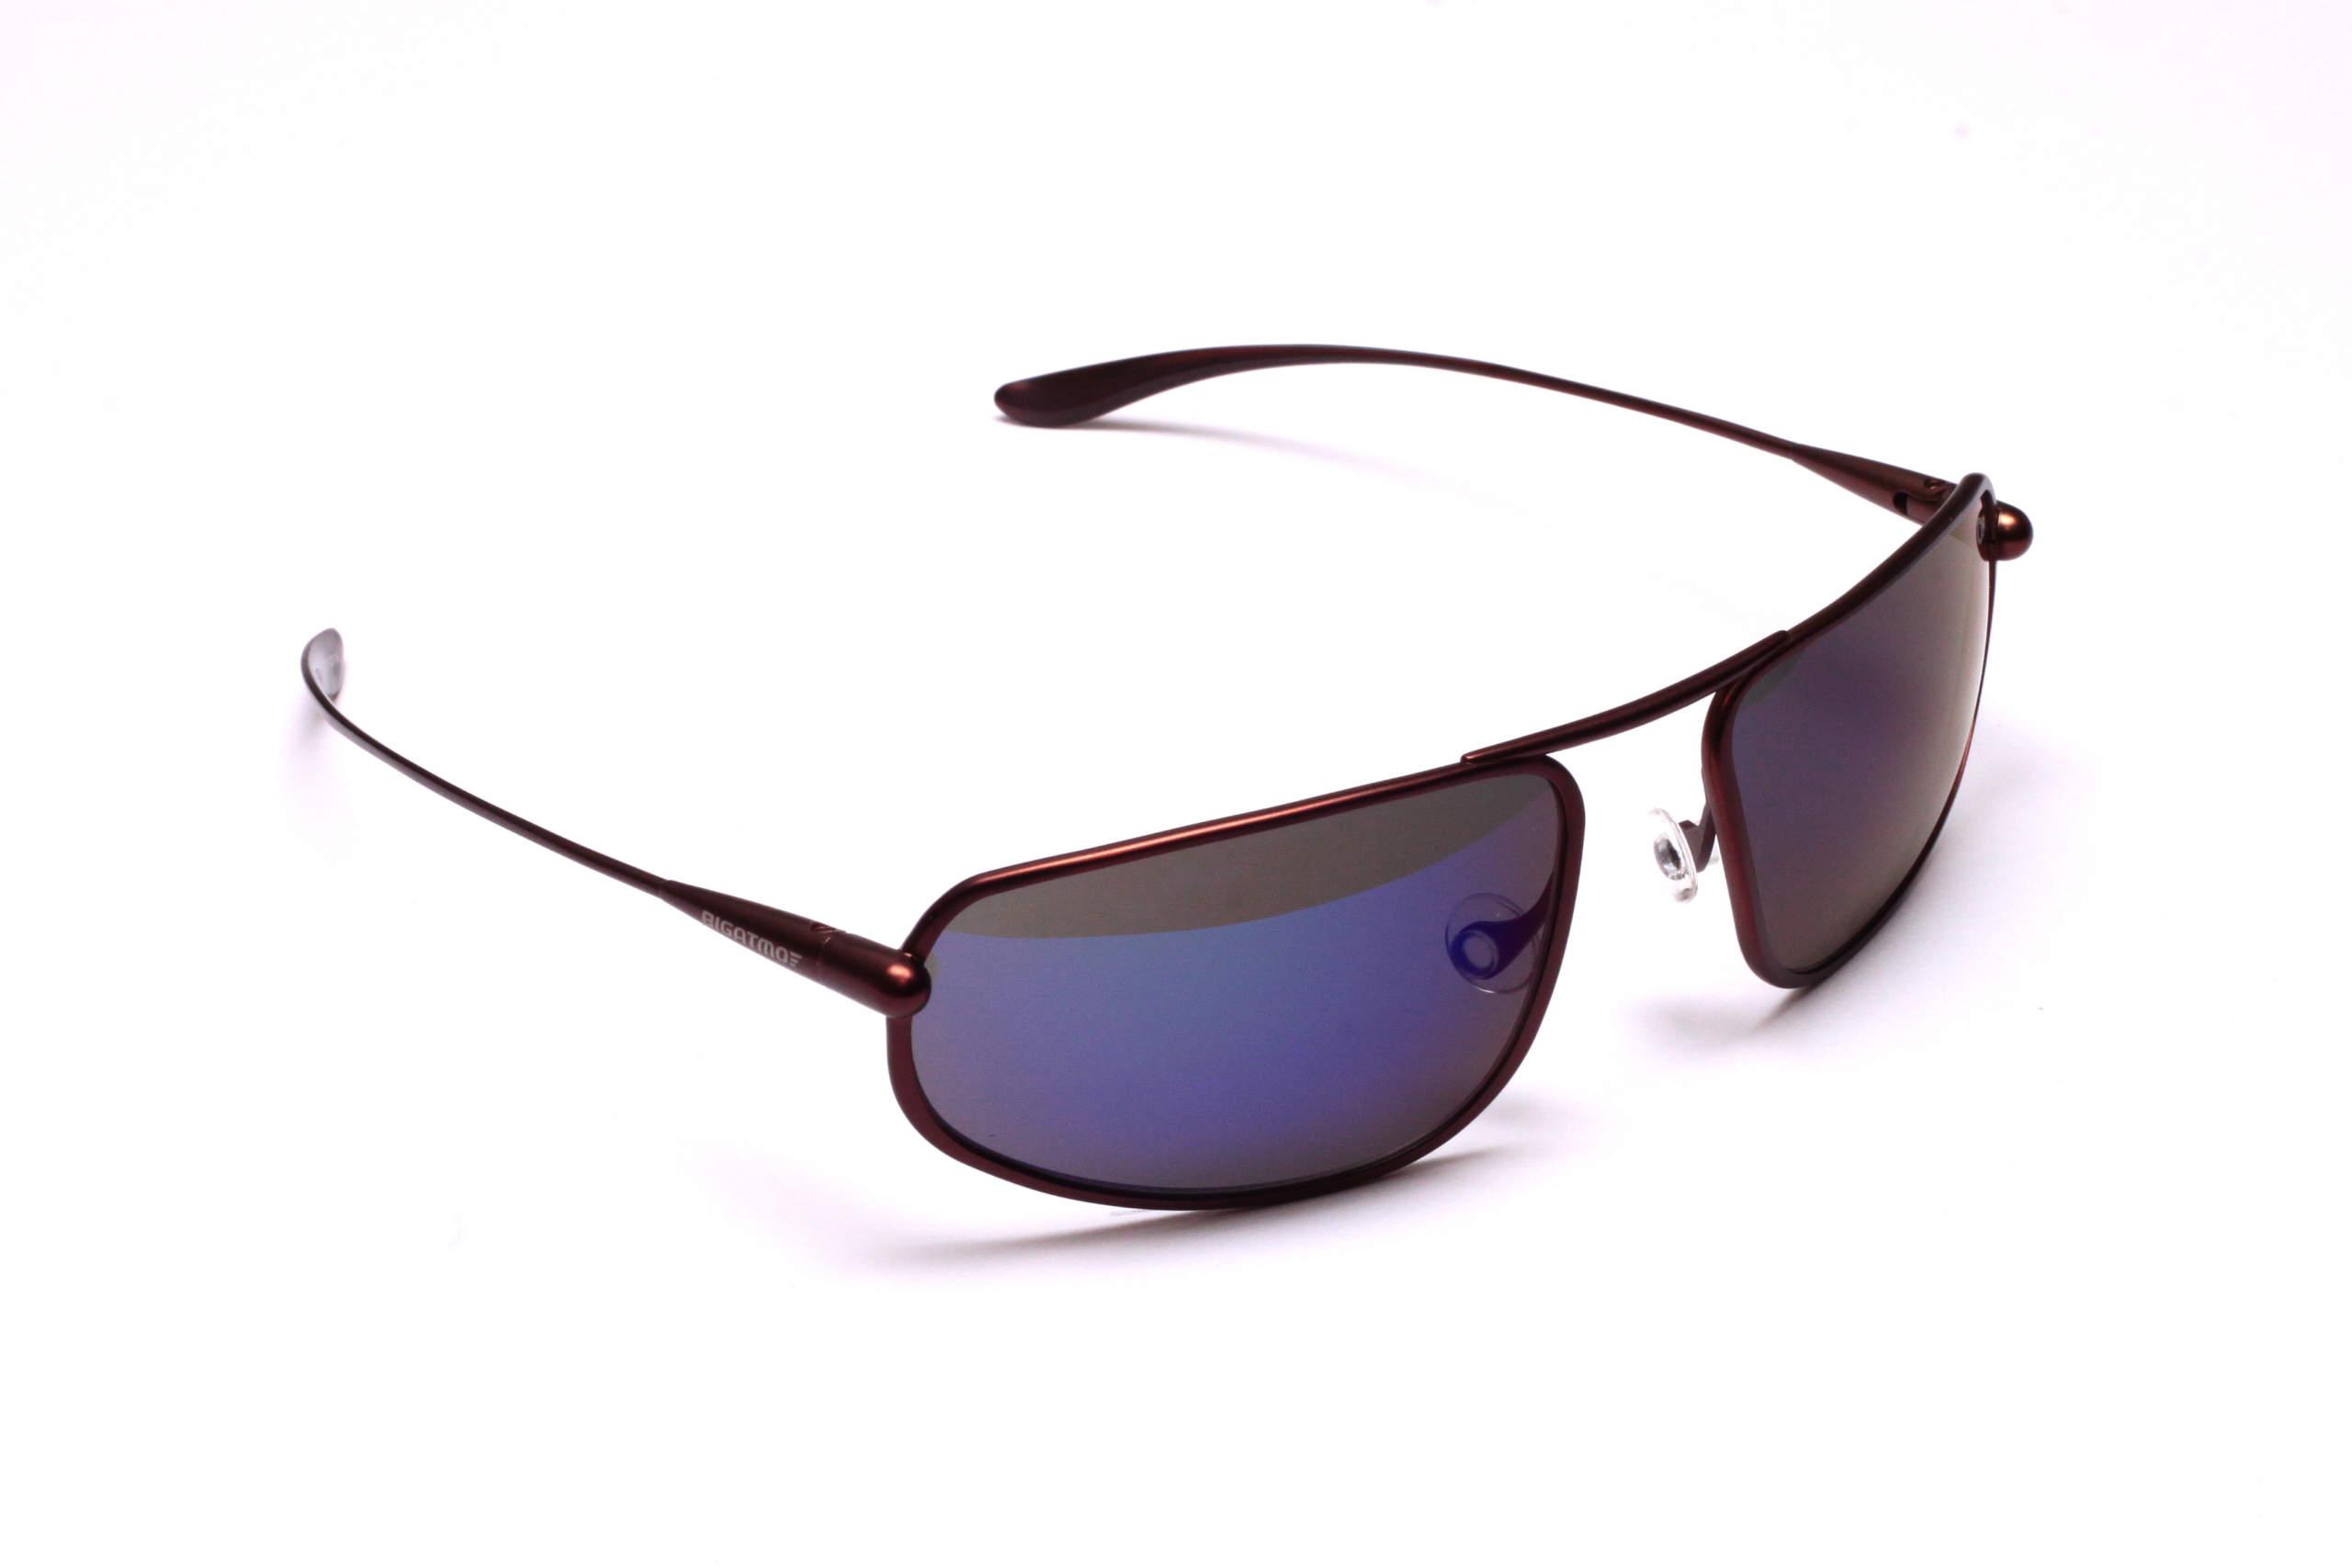 Strato - Brunello Titanium Frame Iridescent Blue Mirror Grey High-Contrast Sunglasses